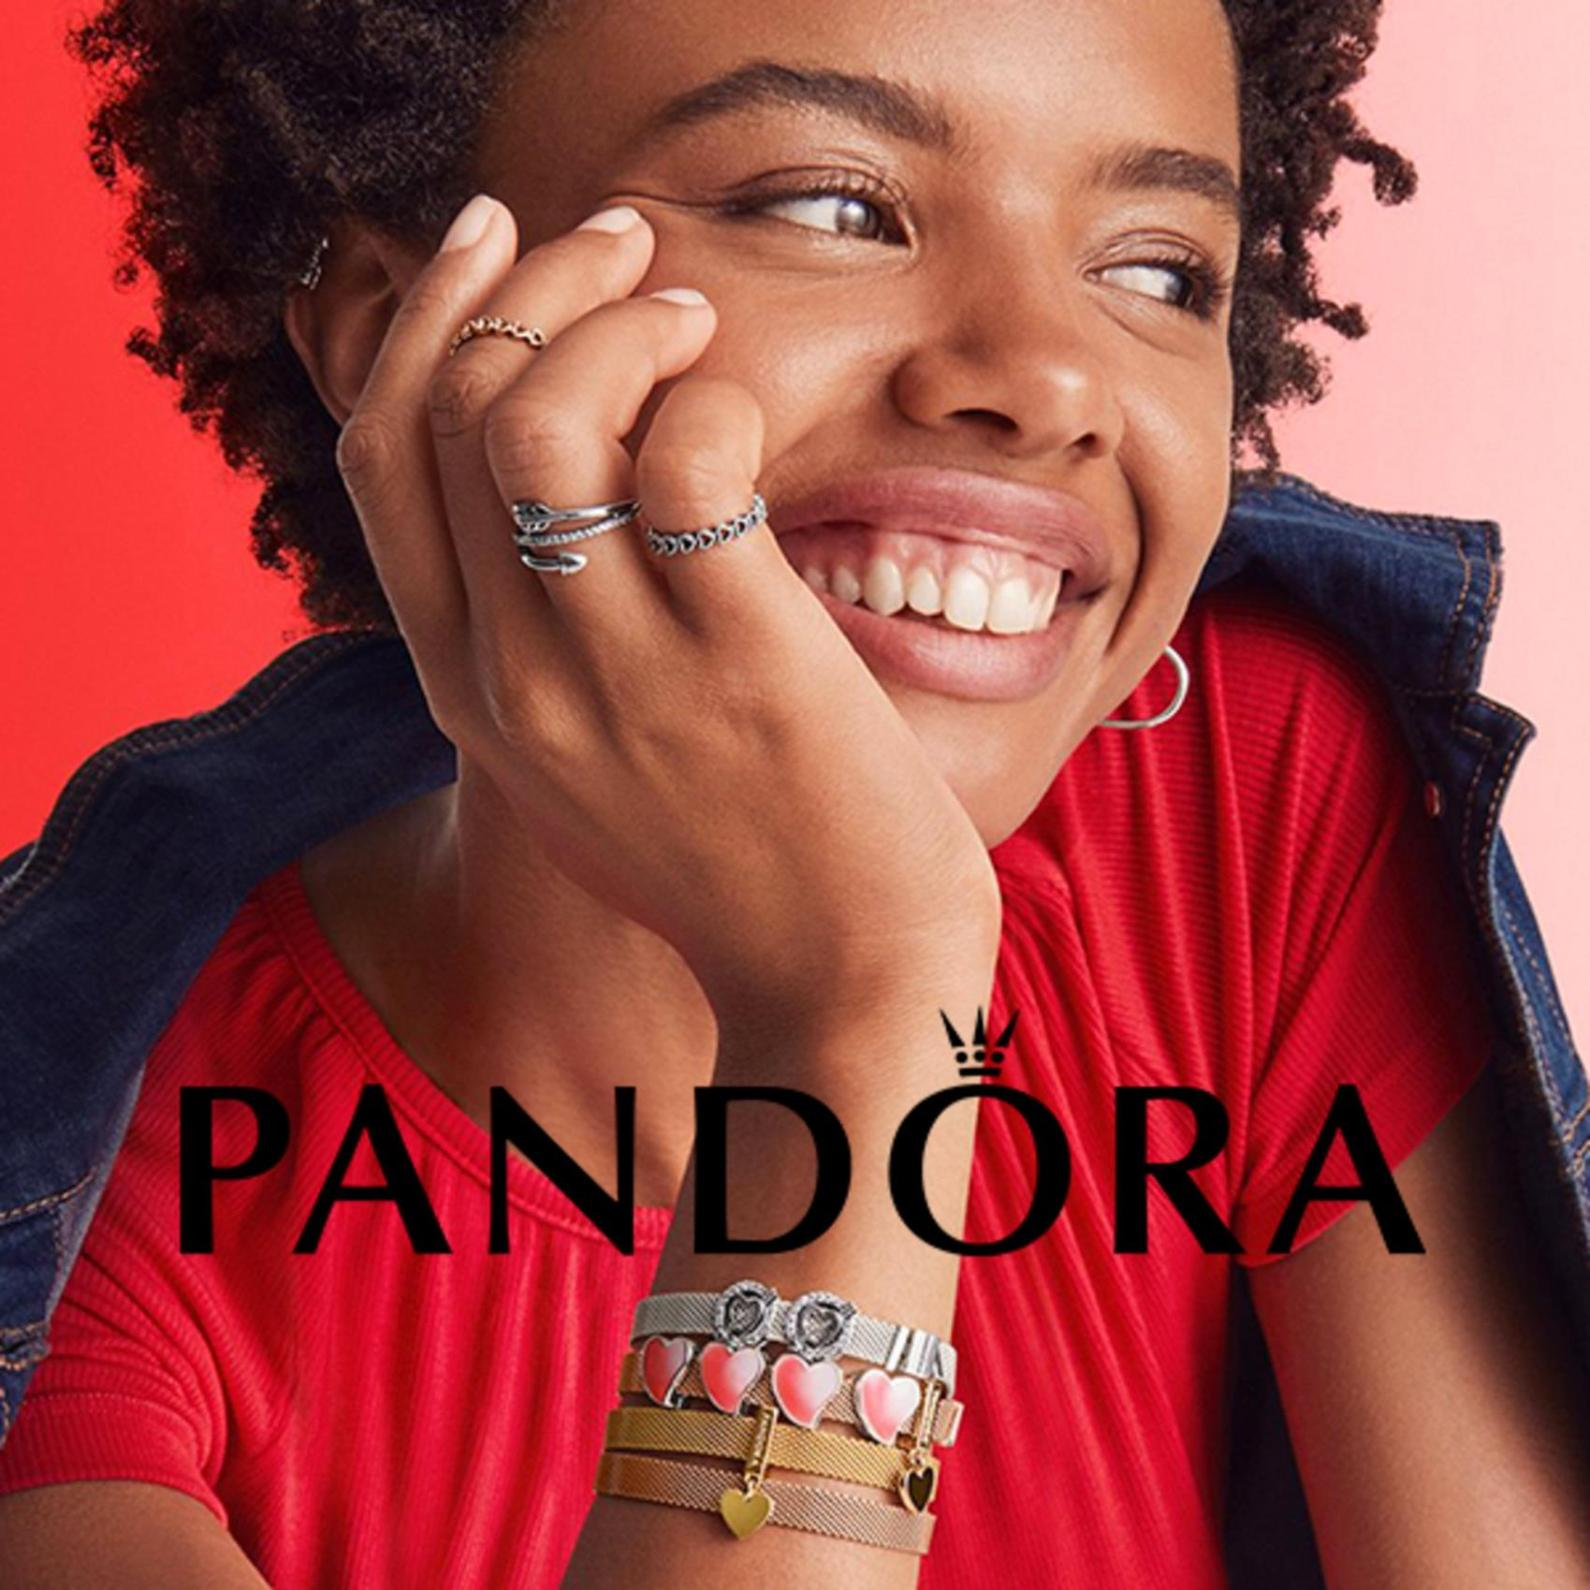 PANDORA - 2019/05/13 - Catálogo PANDORA